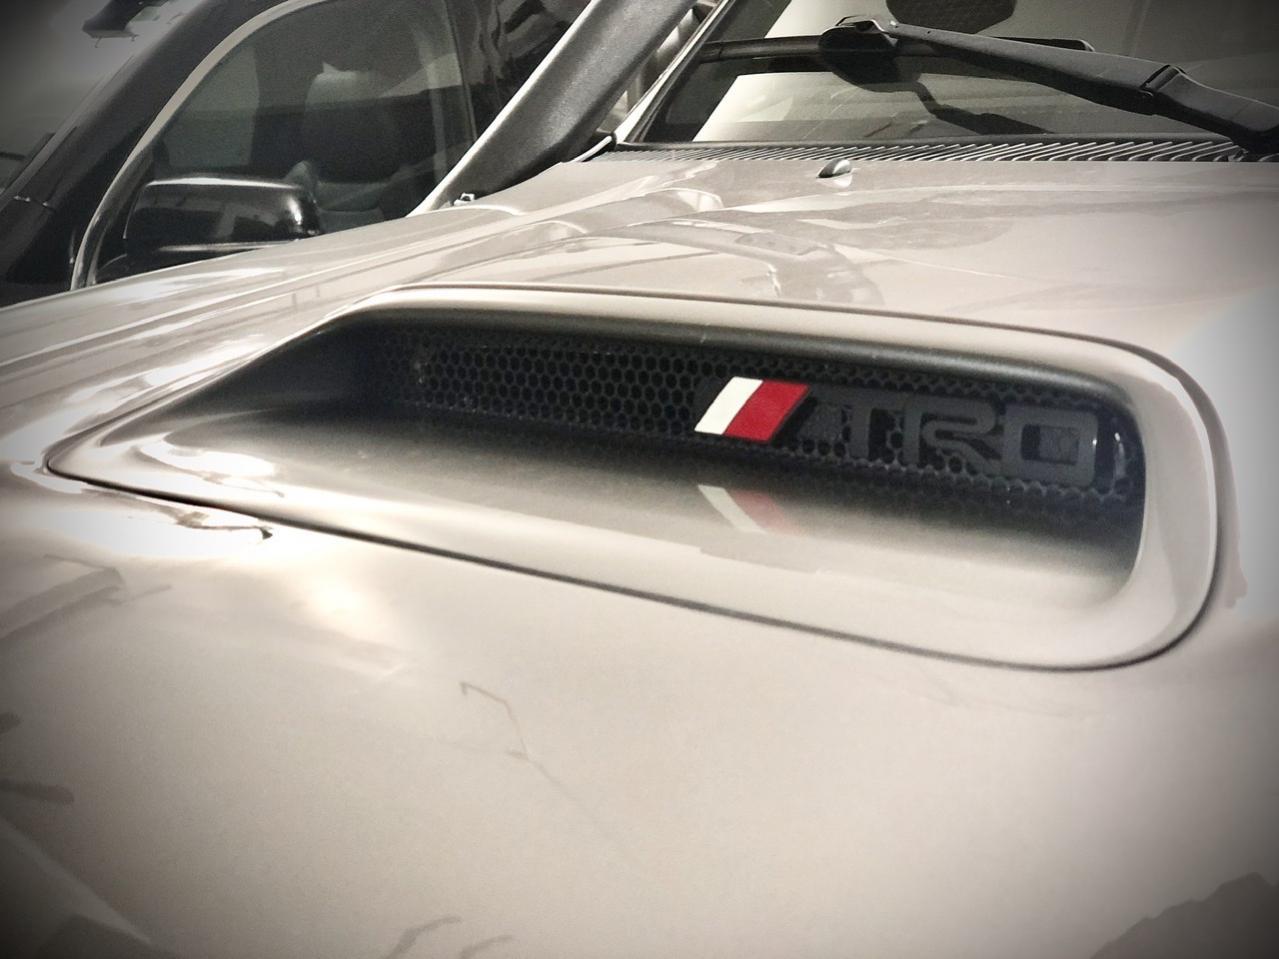 Reboot: Formidable 2002 Thundercloud Metallic Sport Edition TRD Supercharged-e773ffe3-21dc-4cbe-aa81-b9a427a08fe6-jpg